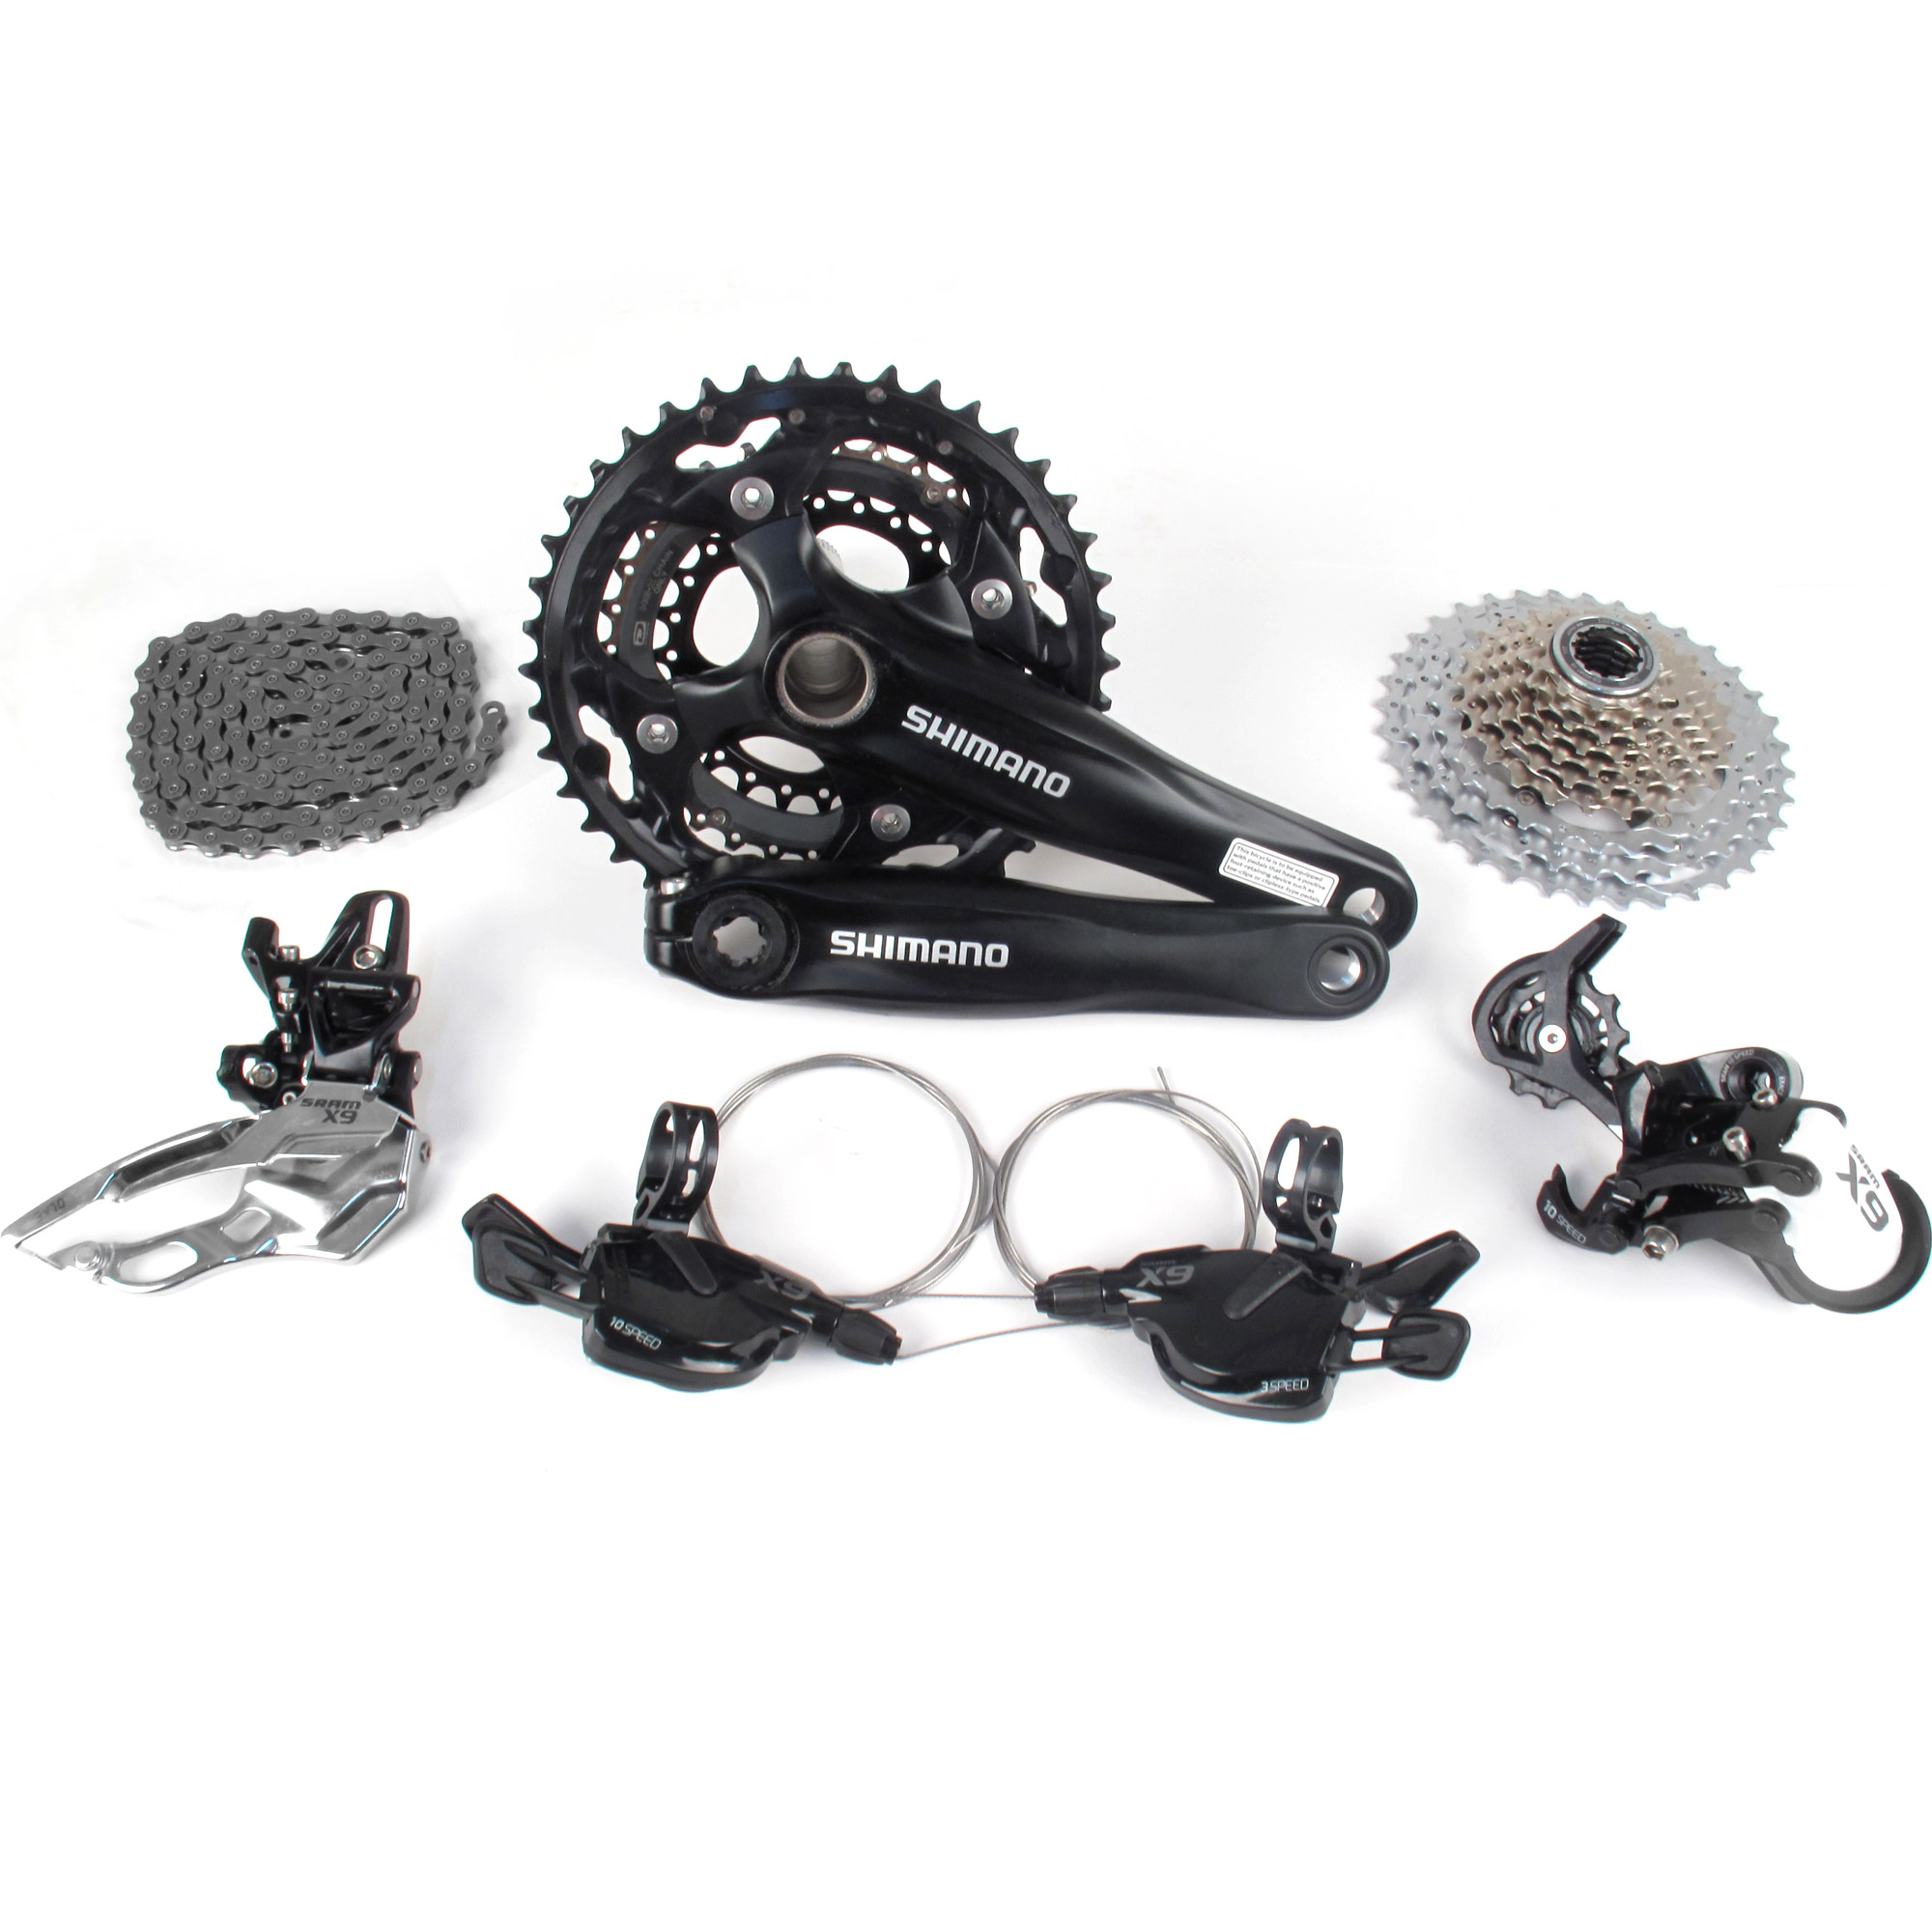 SRAM X9 SHIMANO SLX Mountain Bike Crankset Groupset 3x10 Speed // FC-M552 / HG81 | eBay